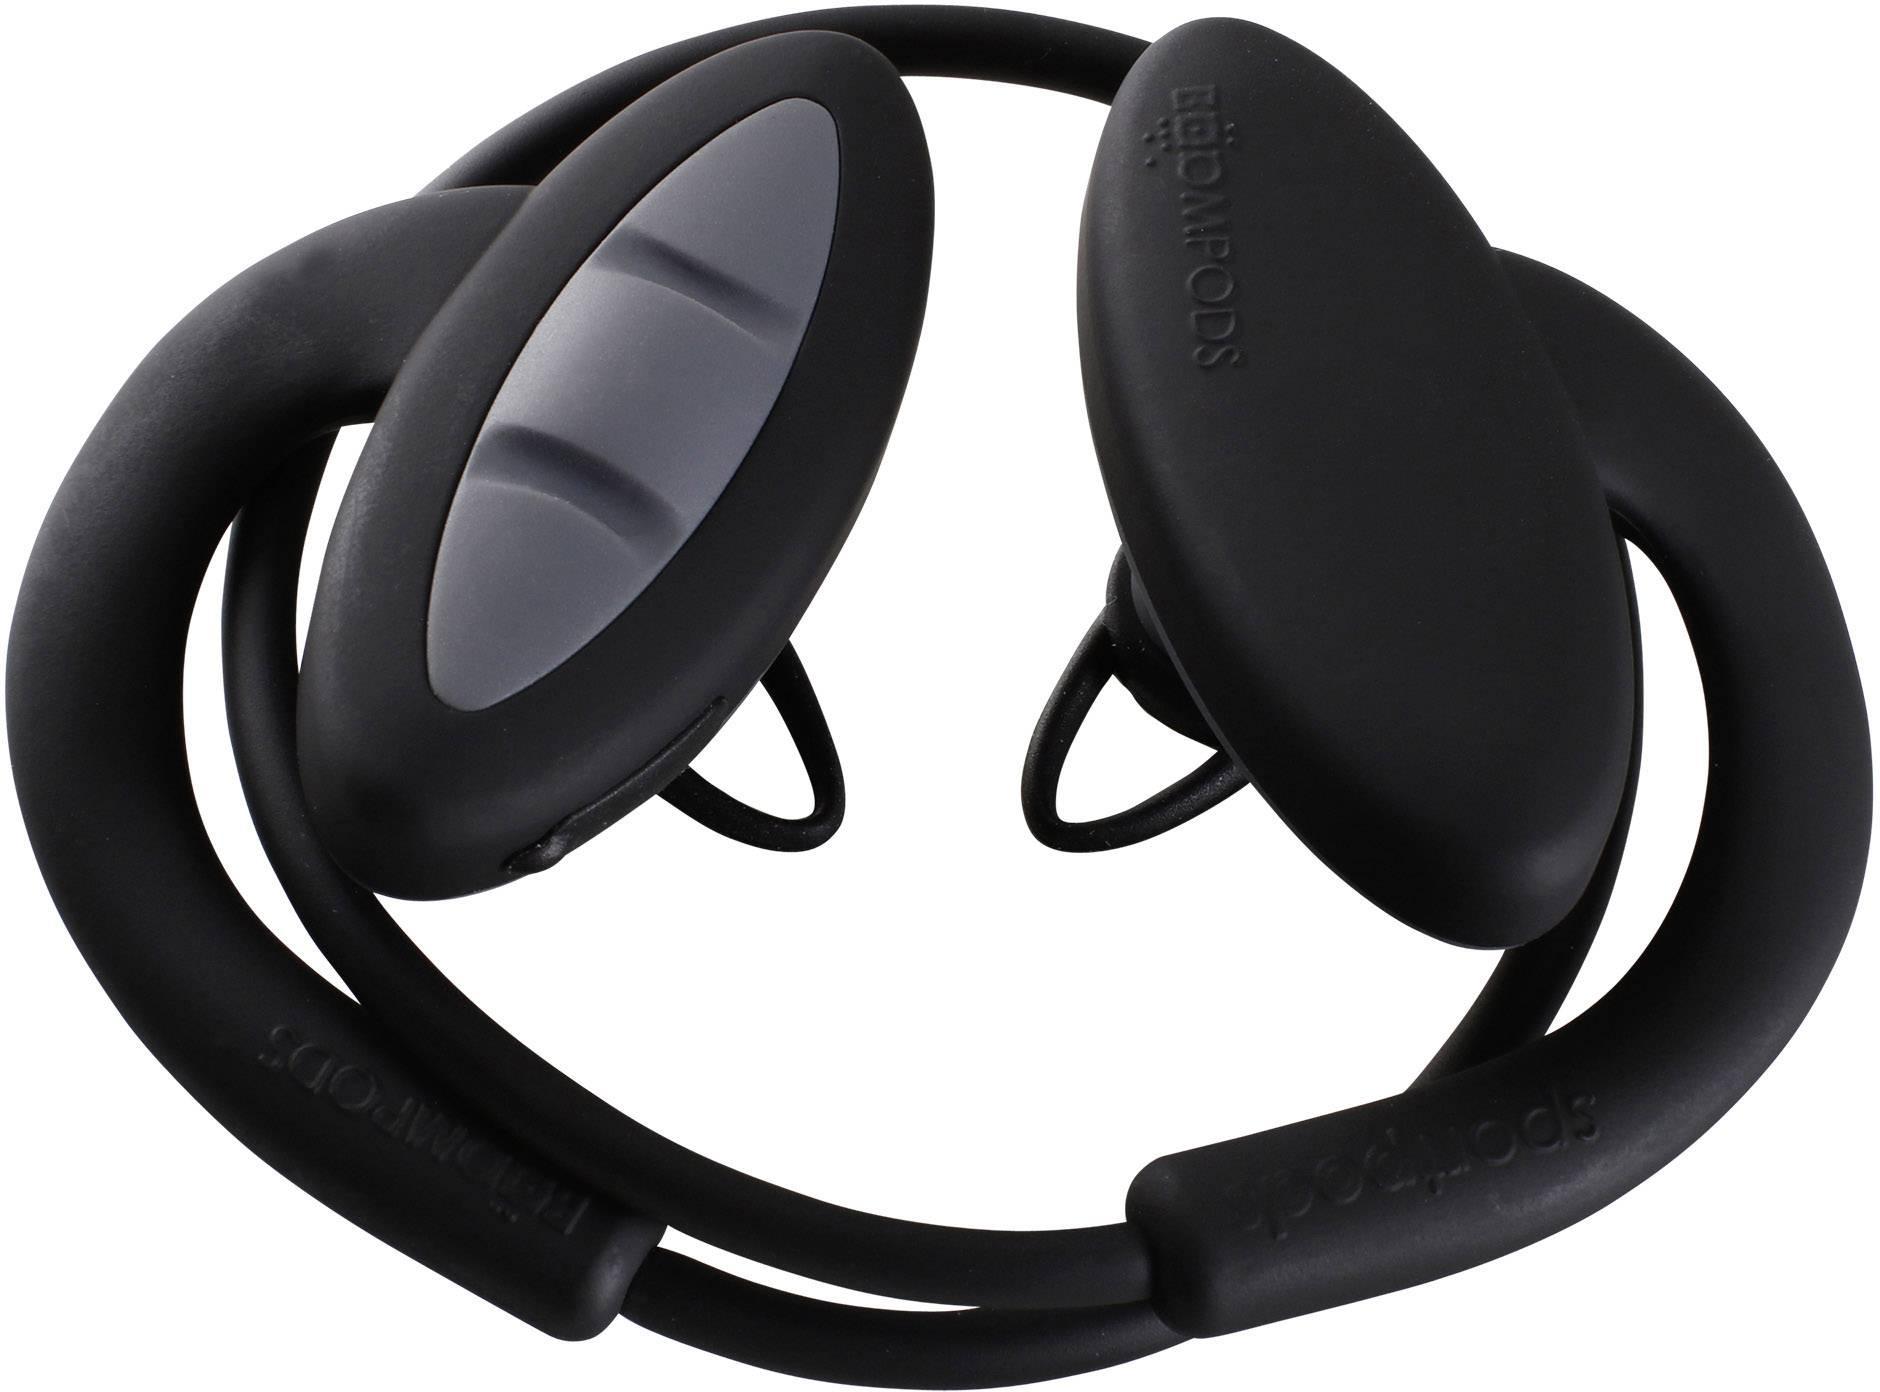 Boompods Sportpods 2 Bluetooth